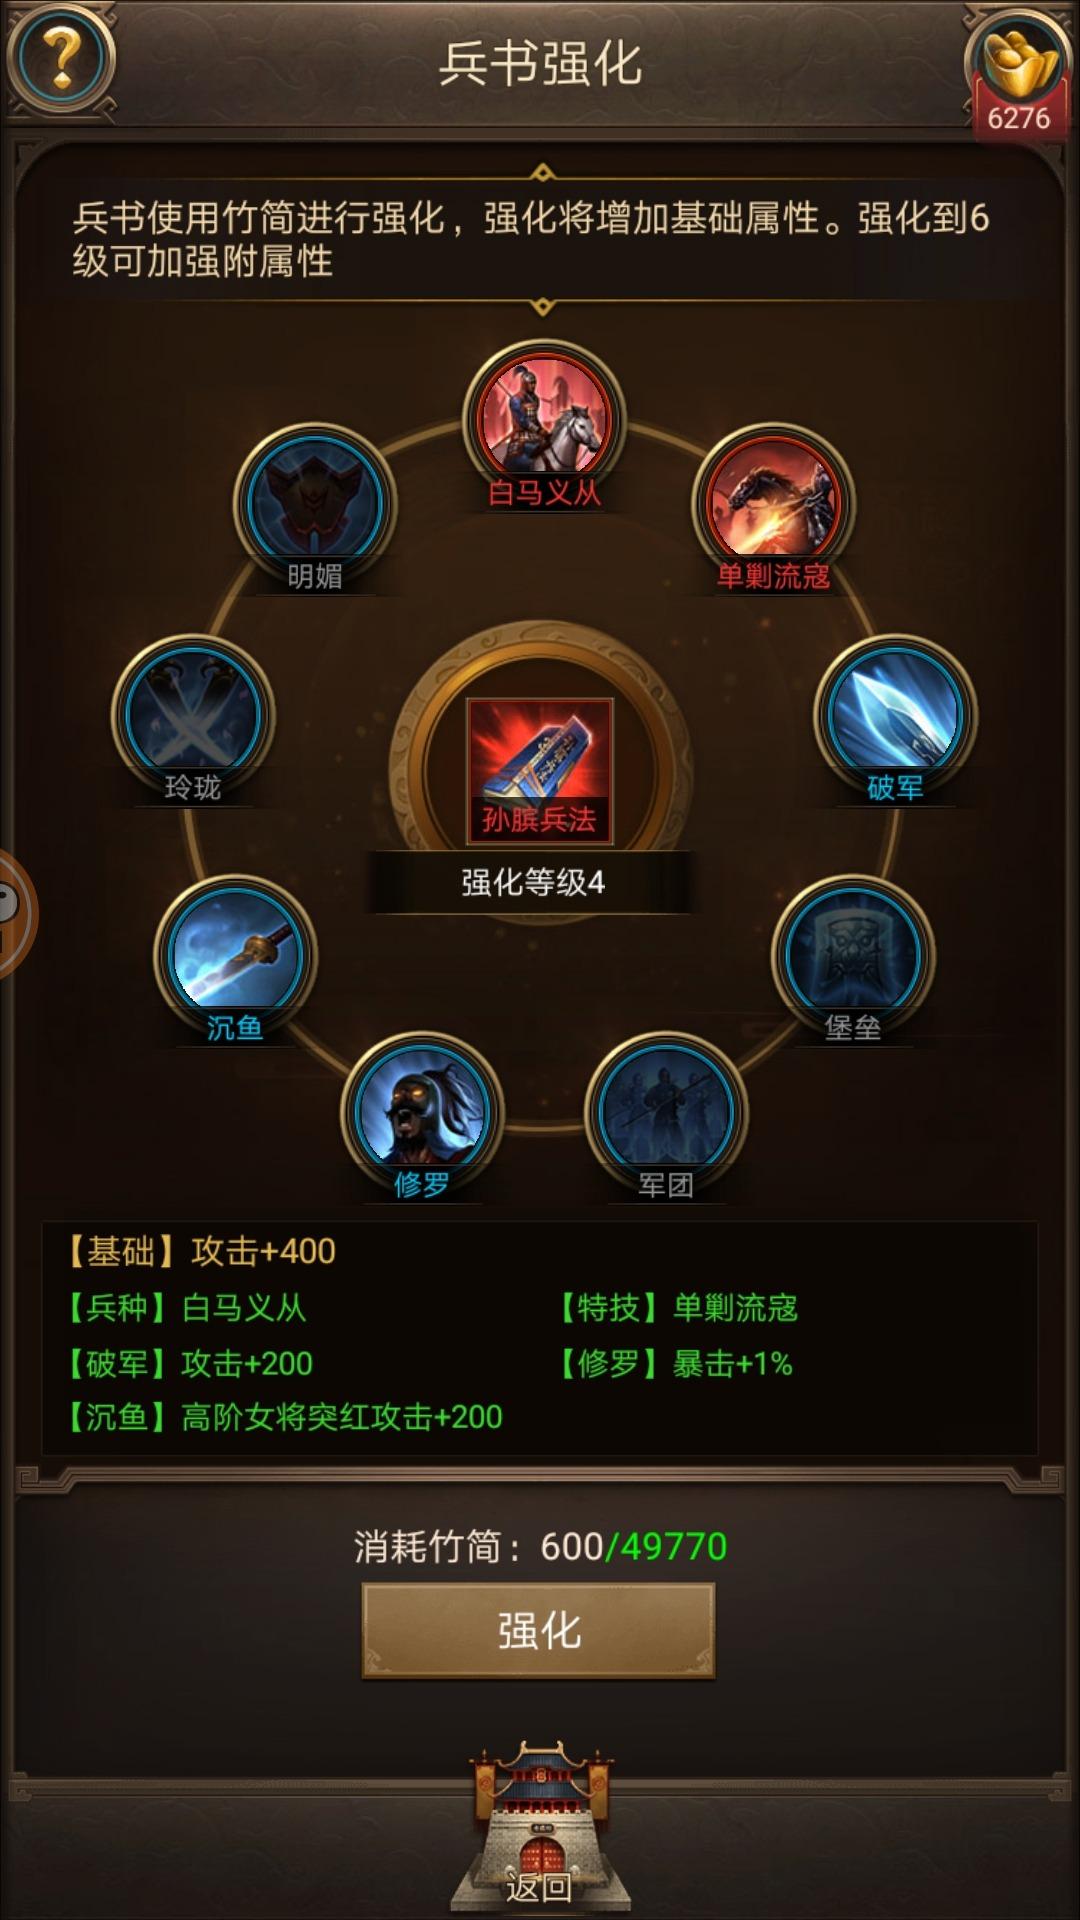 Screenshot_20200310_142955_com.juedigame.sgdjl.shoumeng.jpg